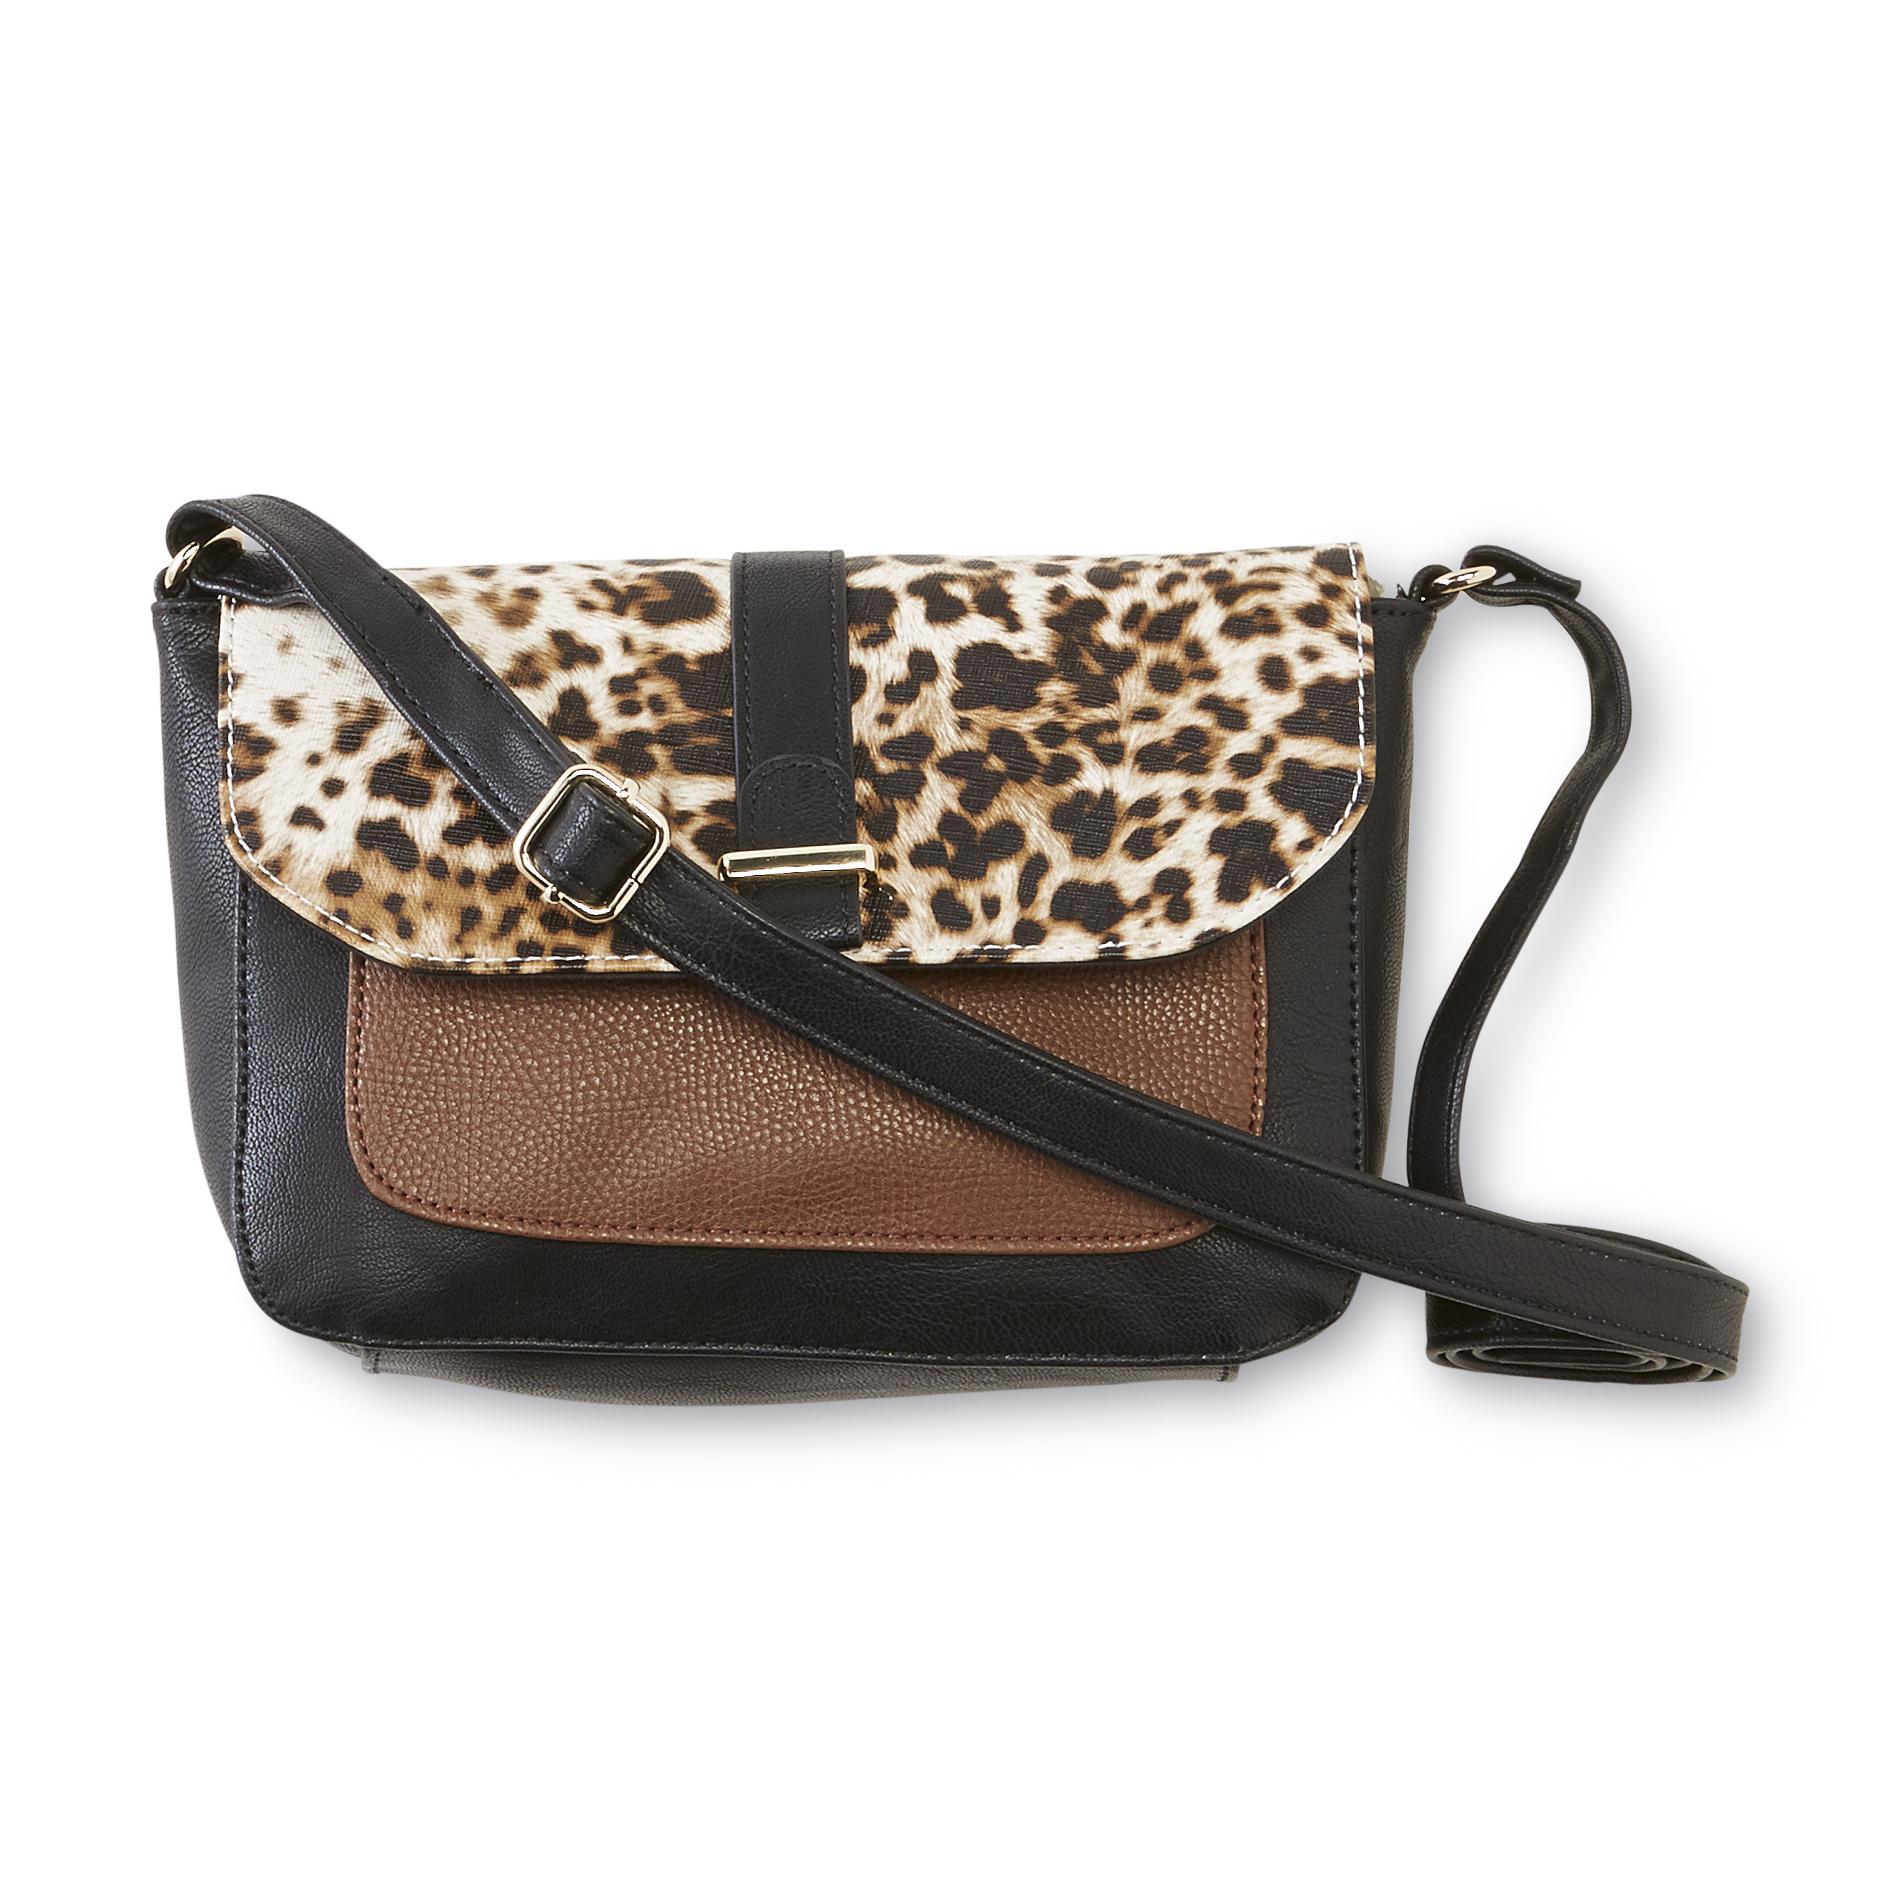 Jaclyn Smith Women's Cape May Shoulder Bag - Cheetah Print